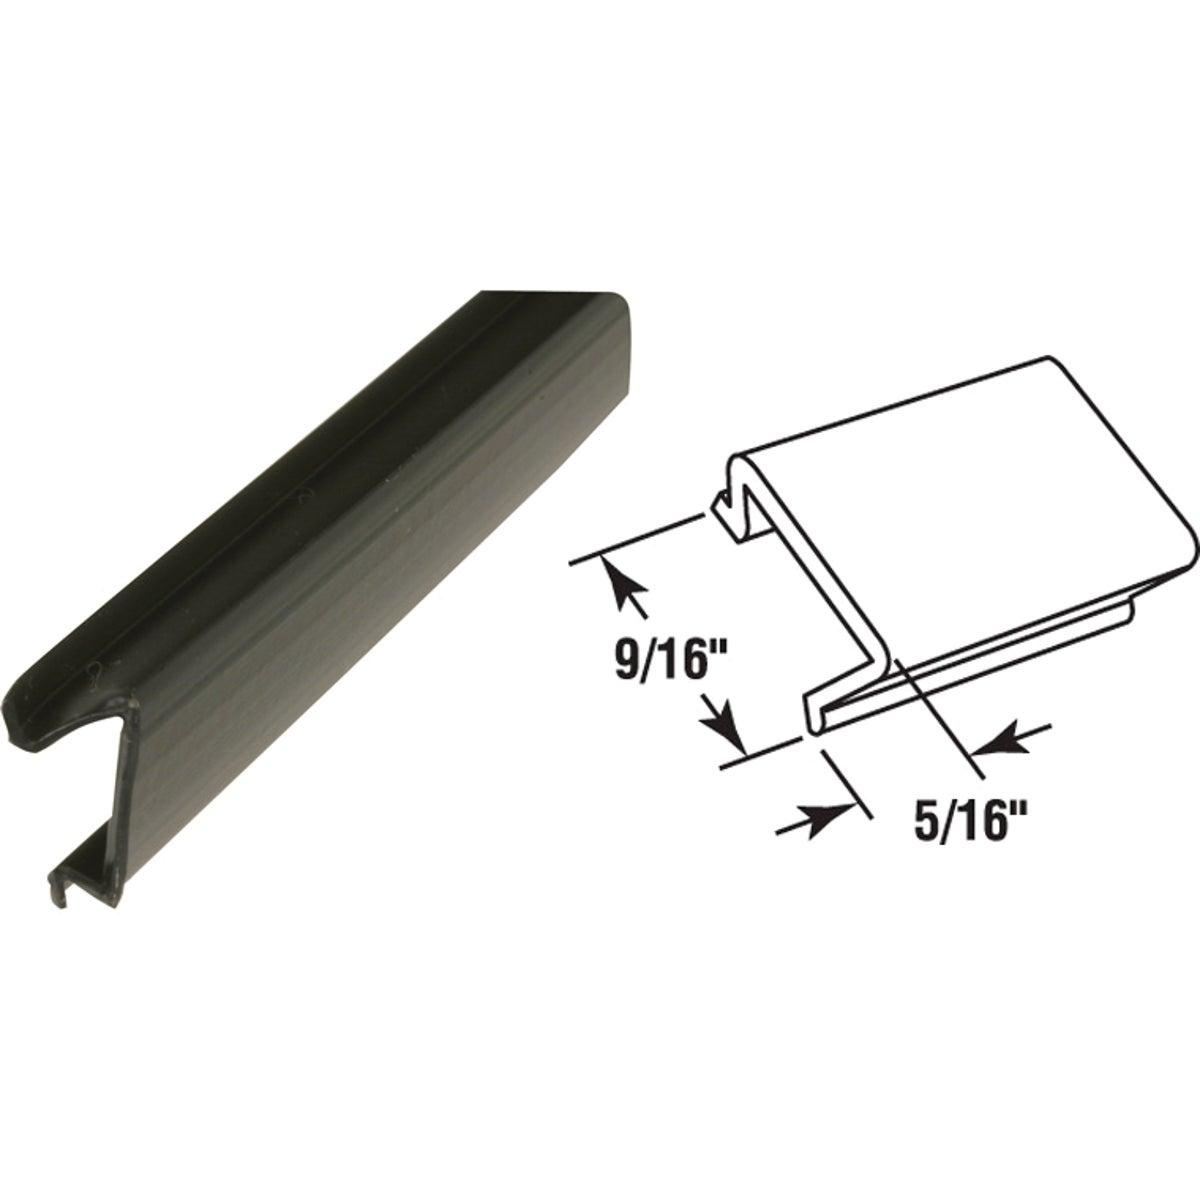 Snap-In Rigid Vinyl Glass Spline